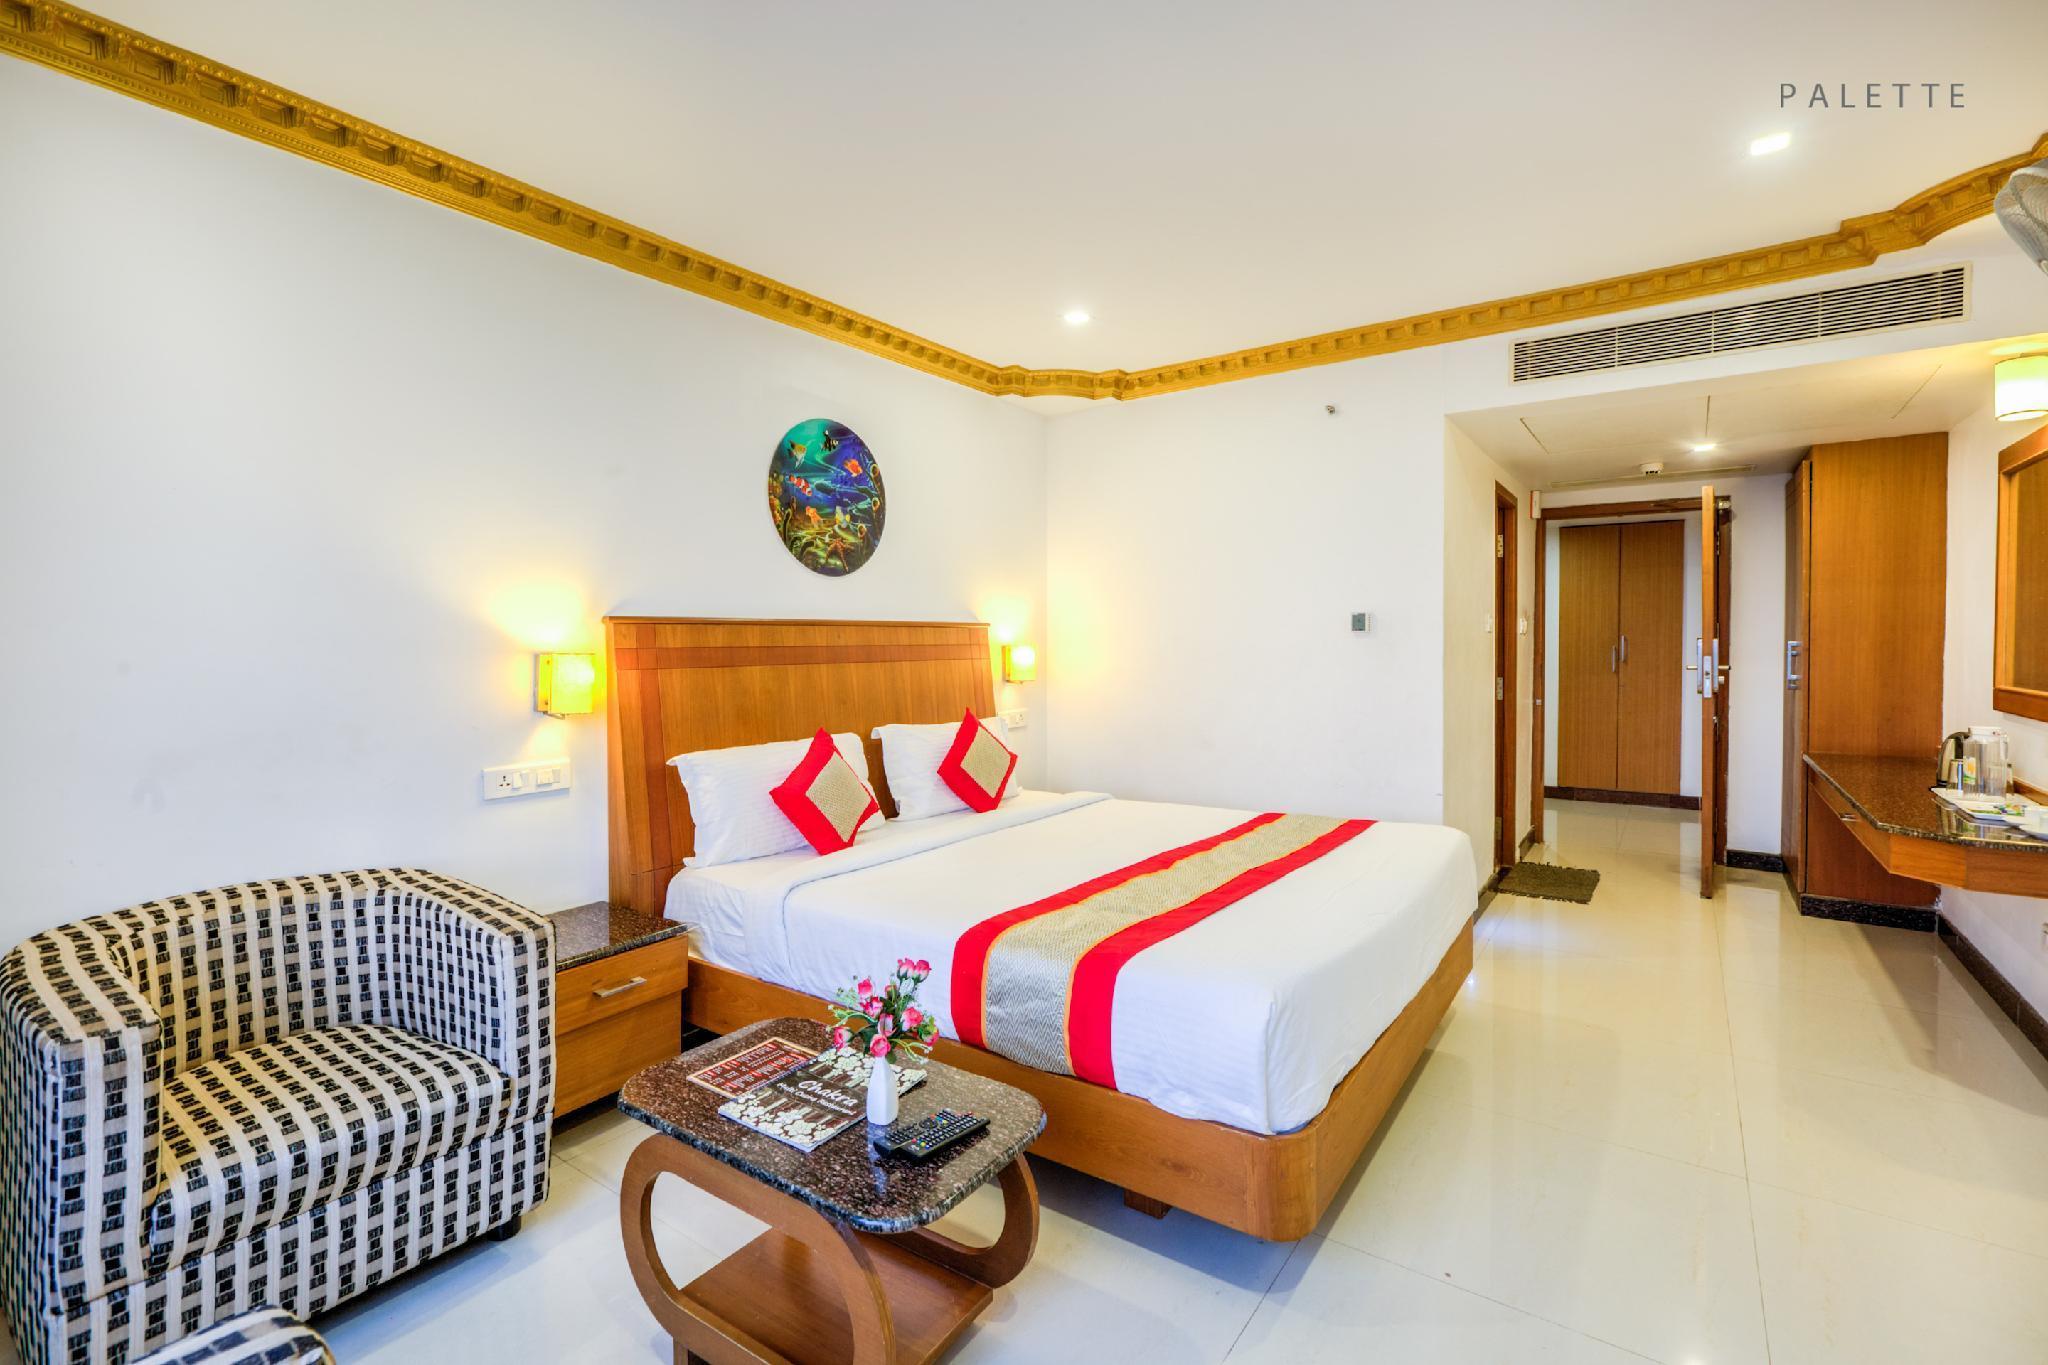 KA Hotel, Tirunelveli